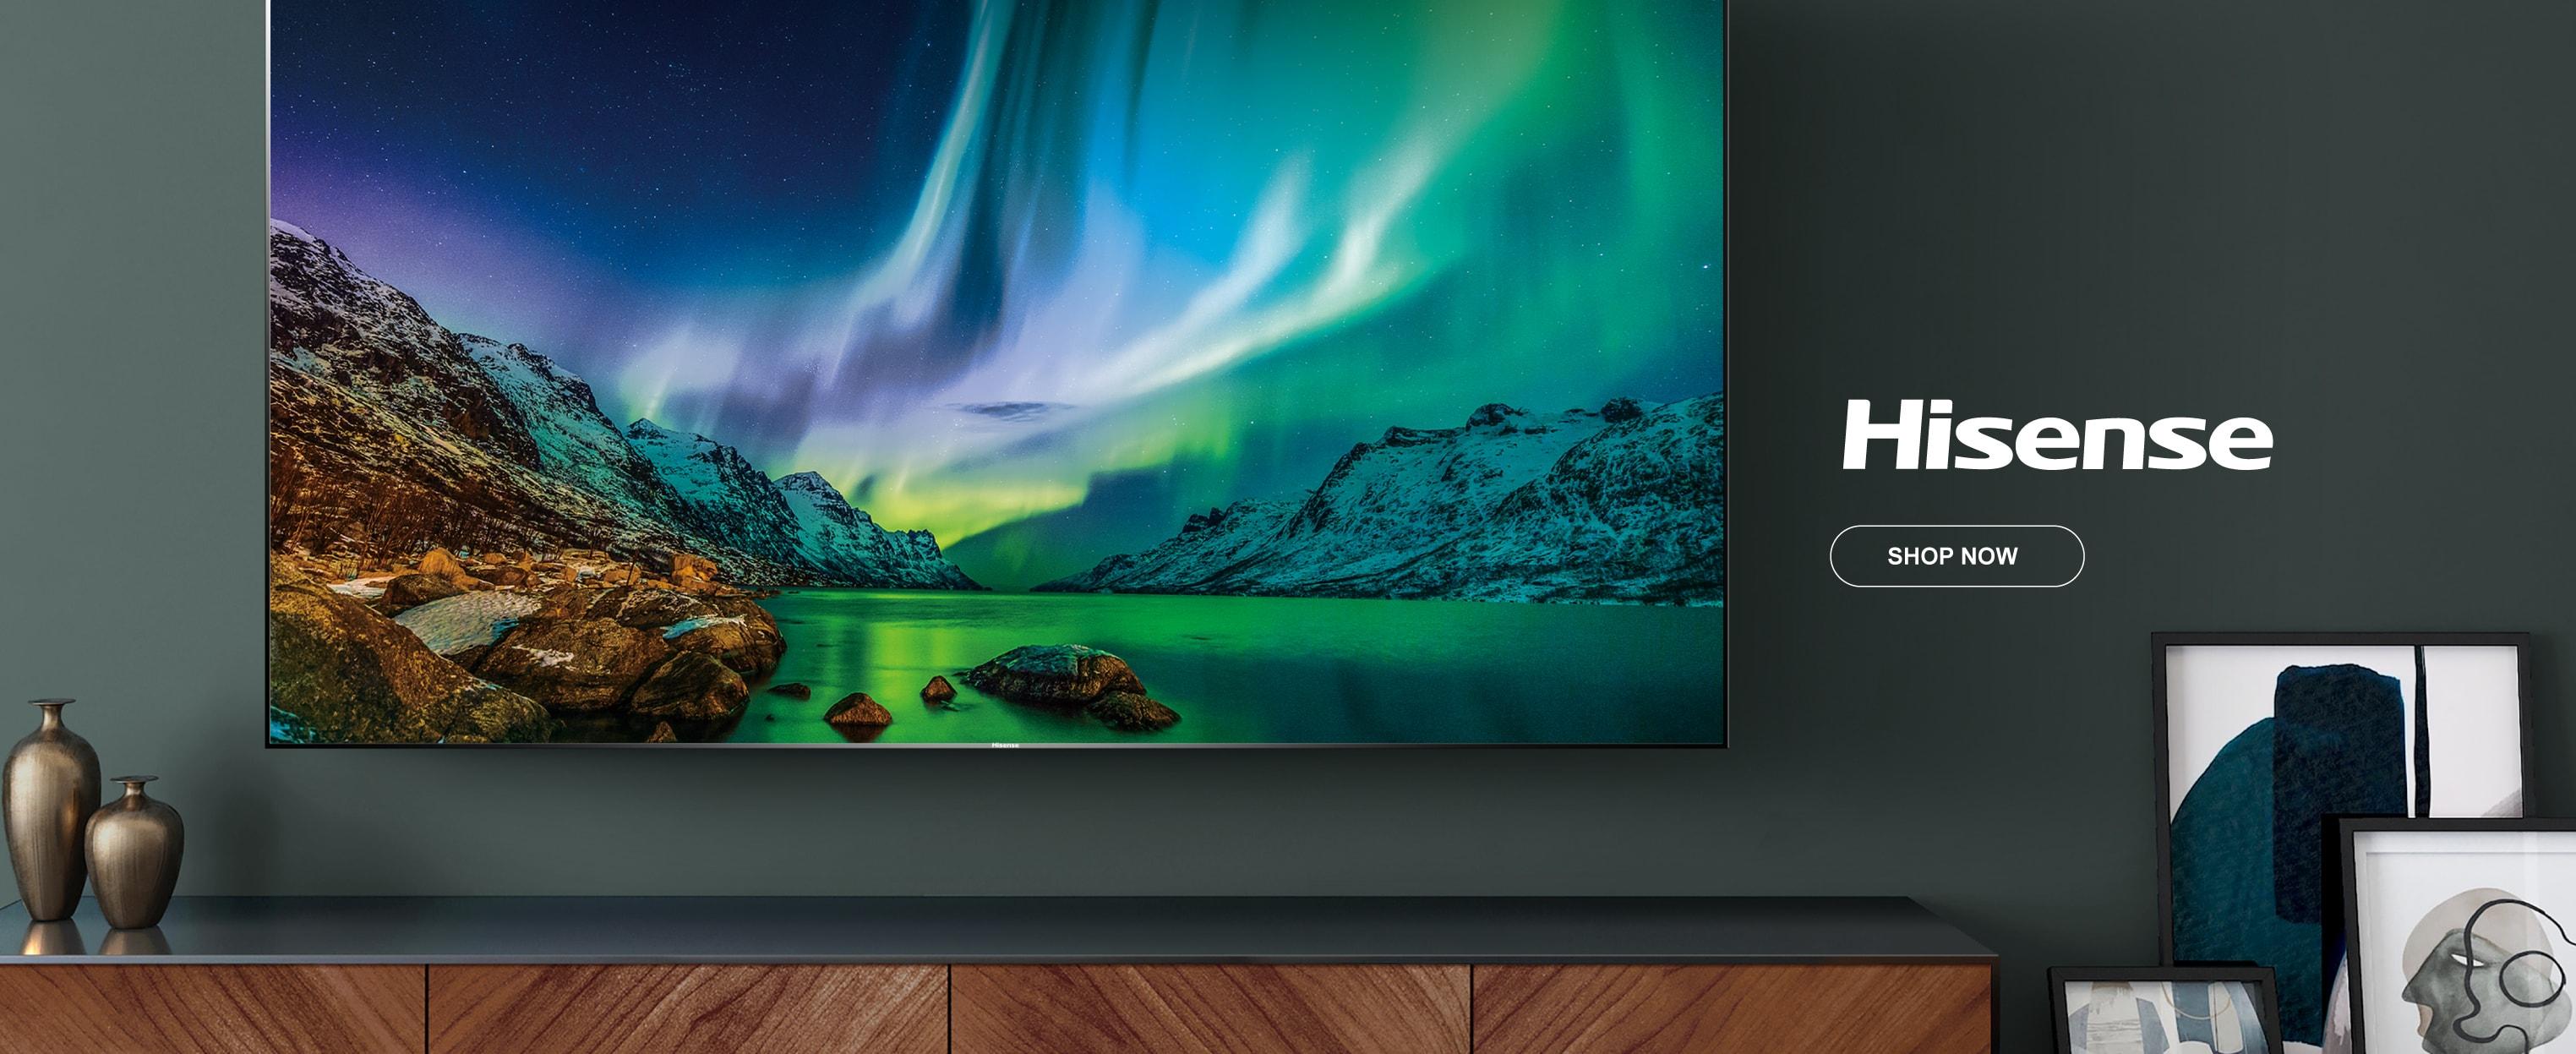 Shop 4K UHD TVs